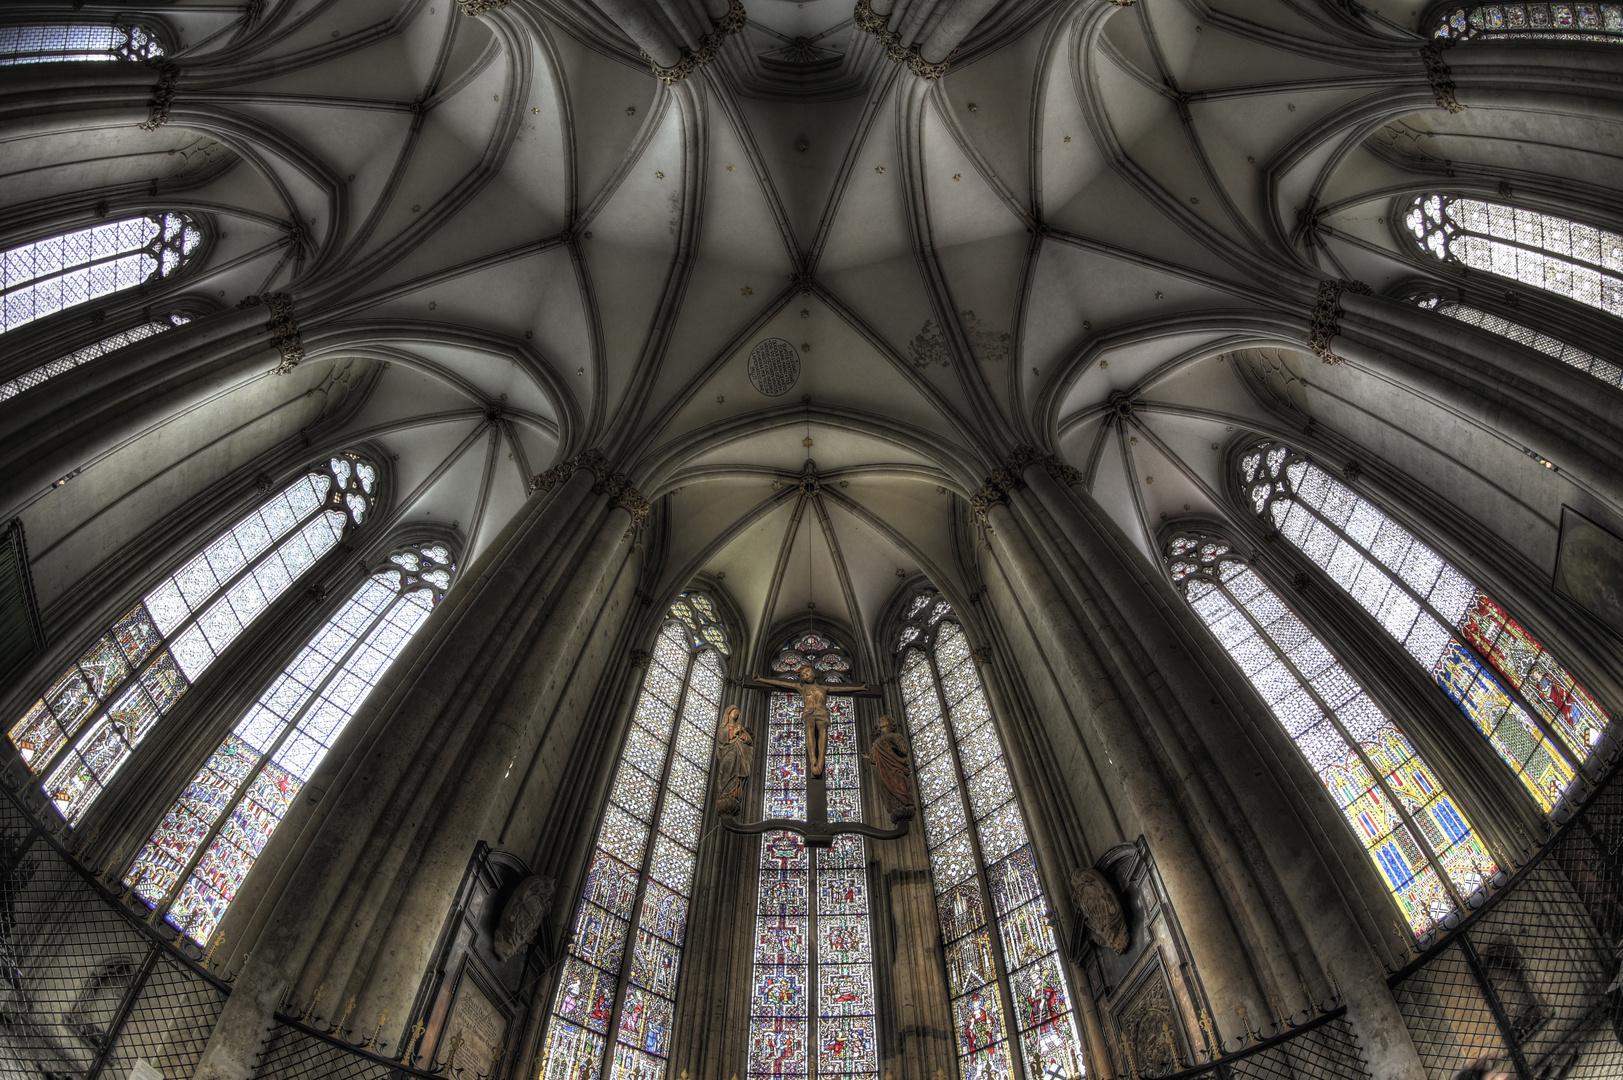 ... Dom zu Köln